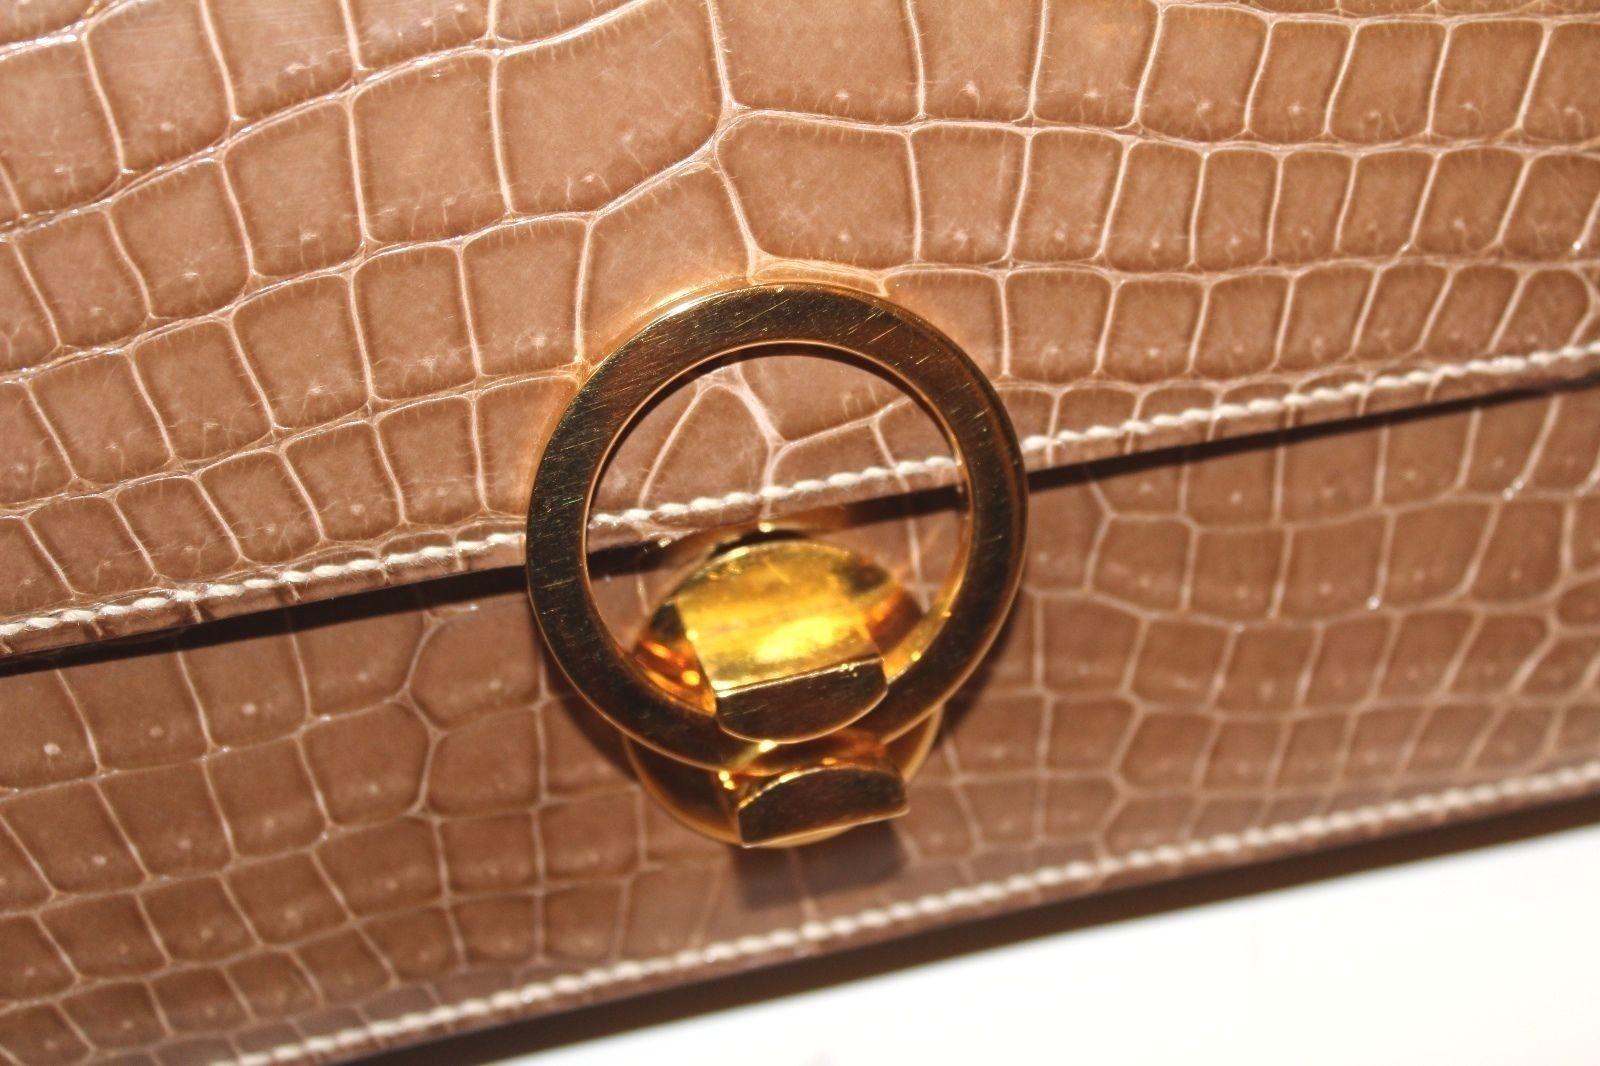 Vintage Hermes  Alligator Crocodile  Handbag Purse clutch image 4